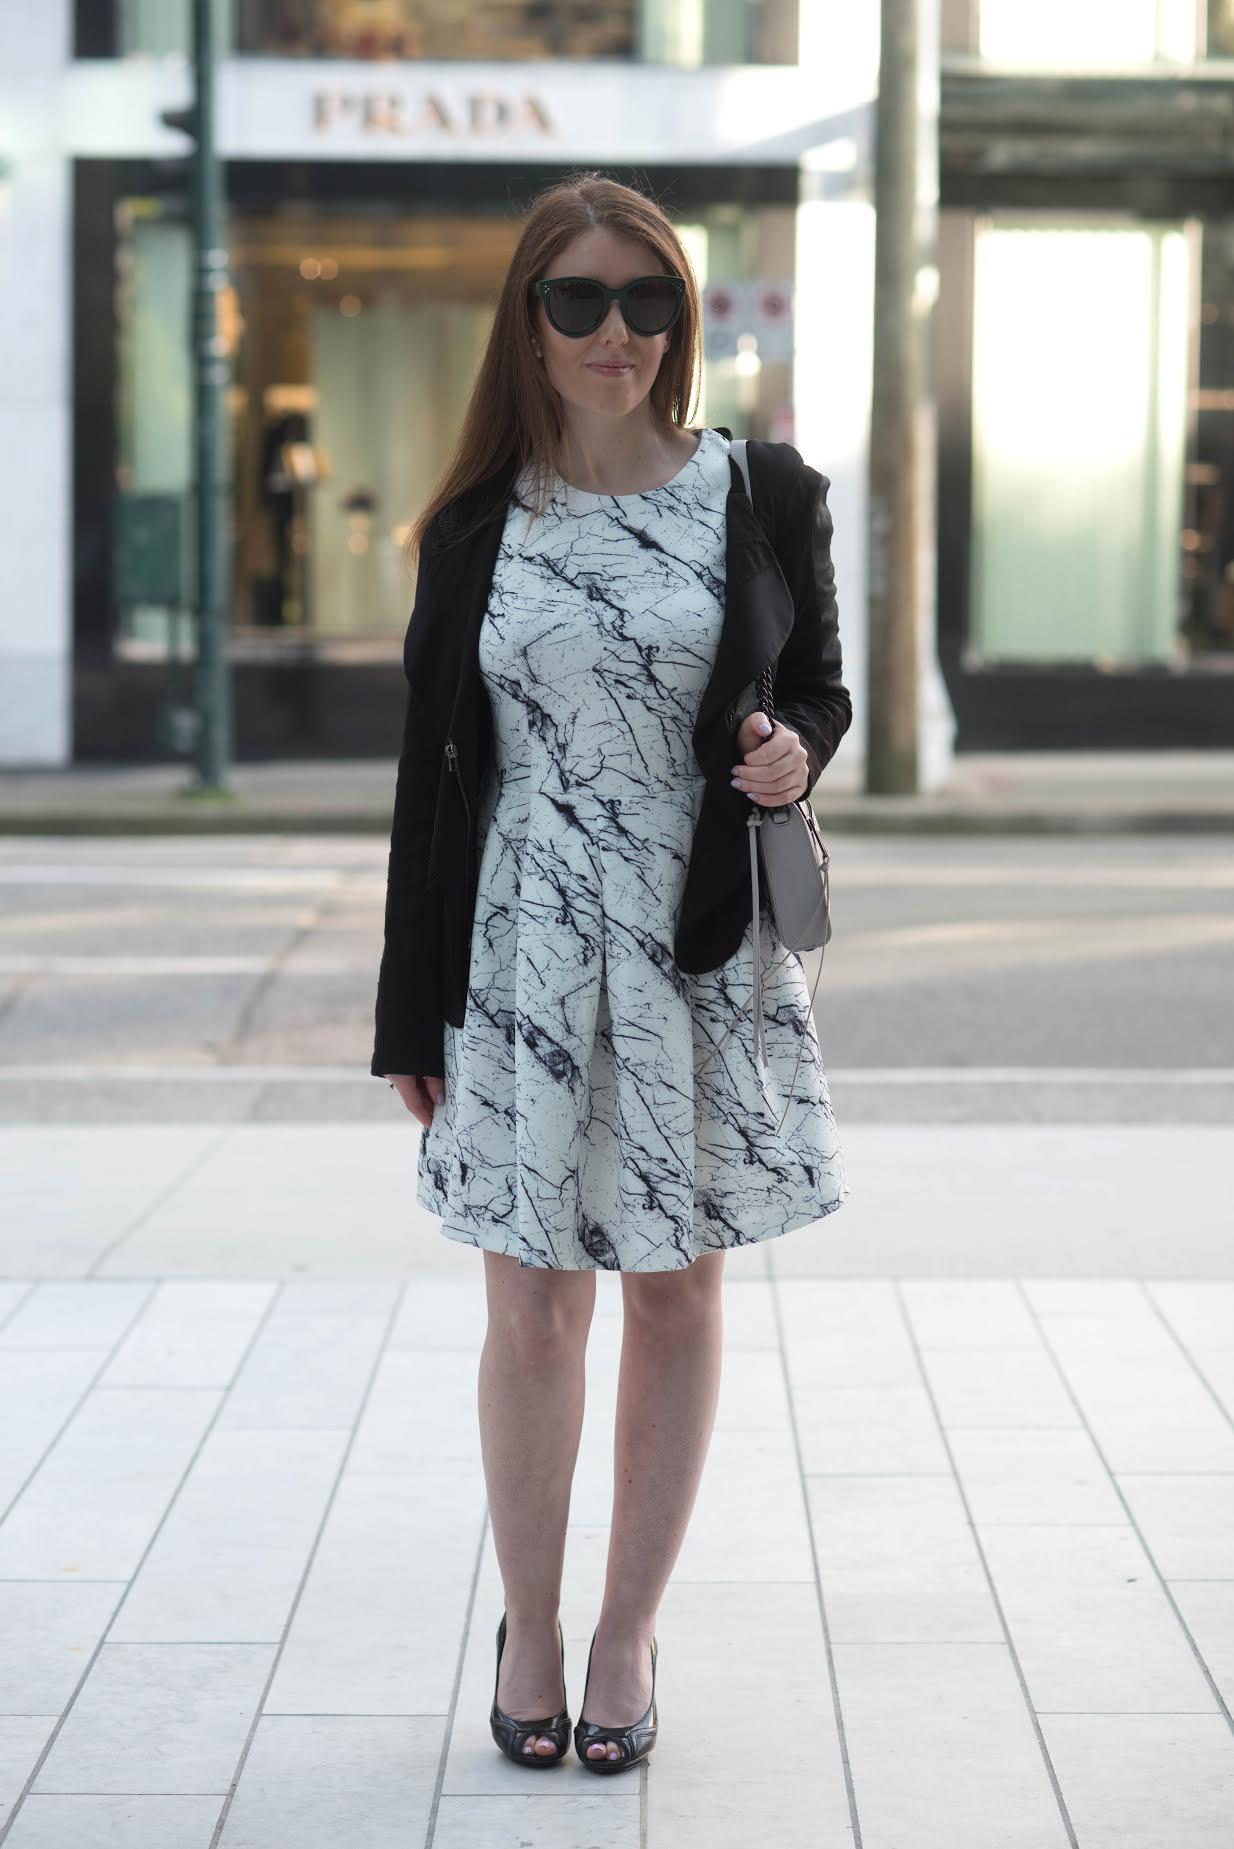 Image: Style Calling